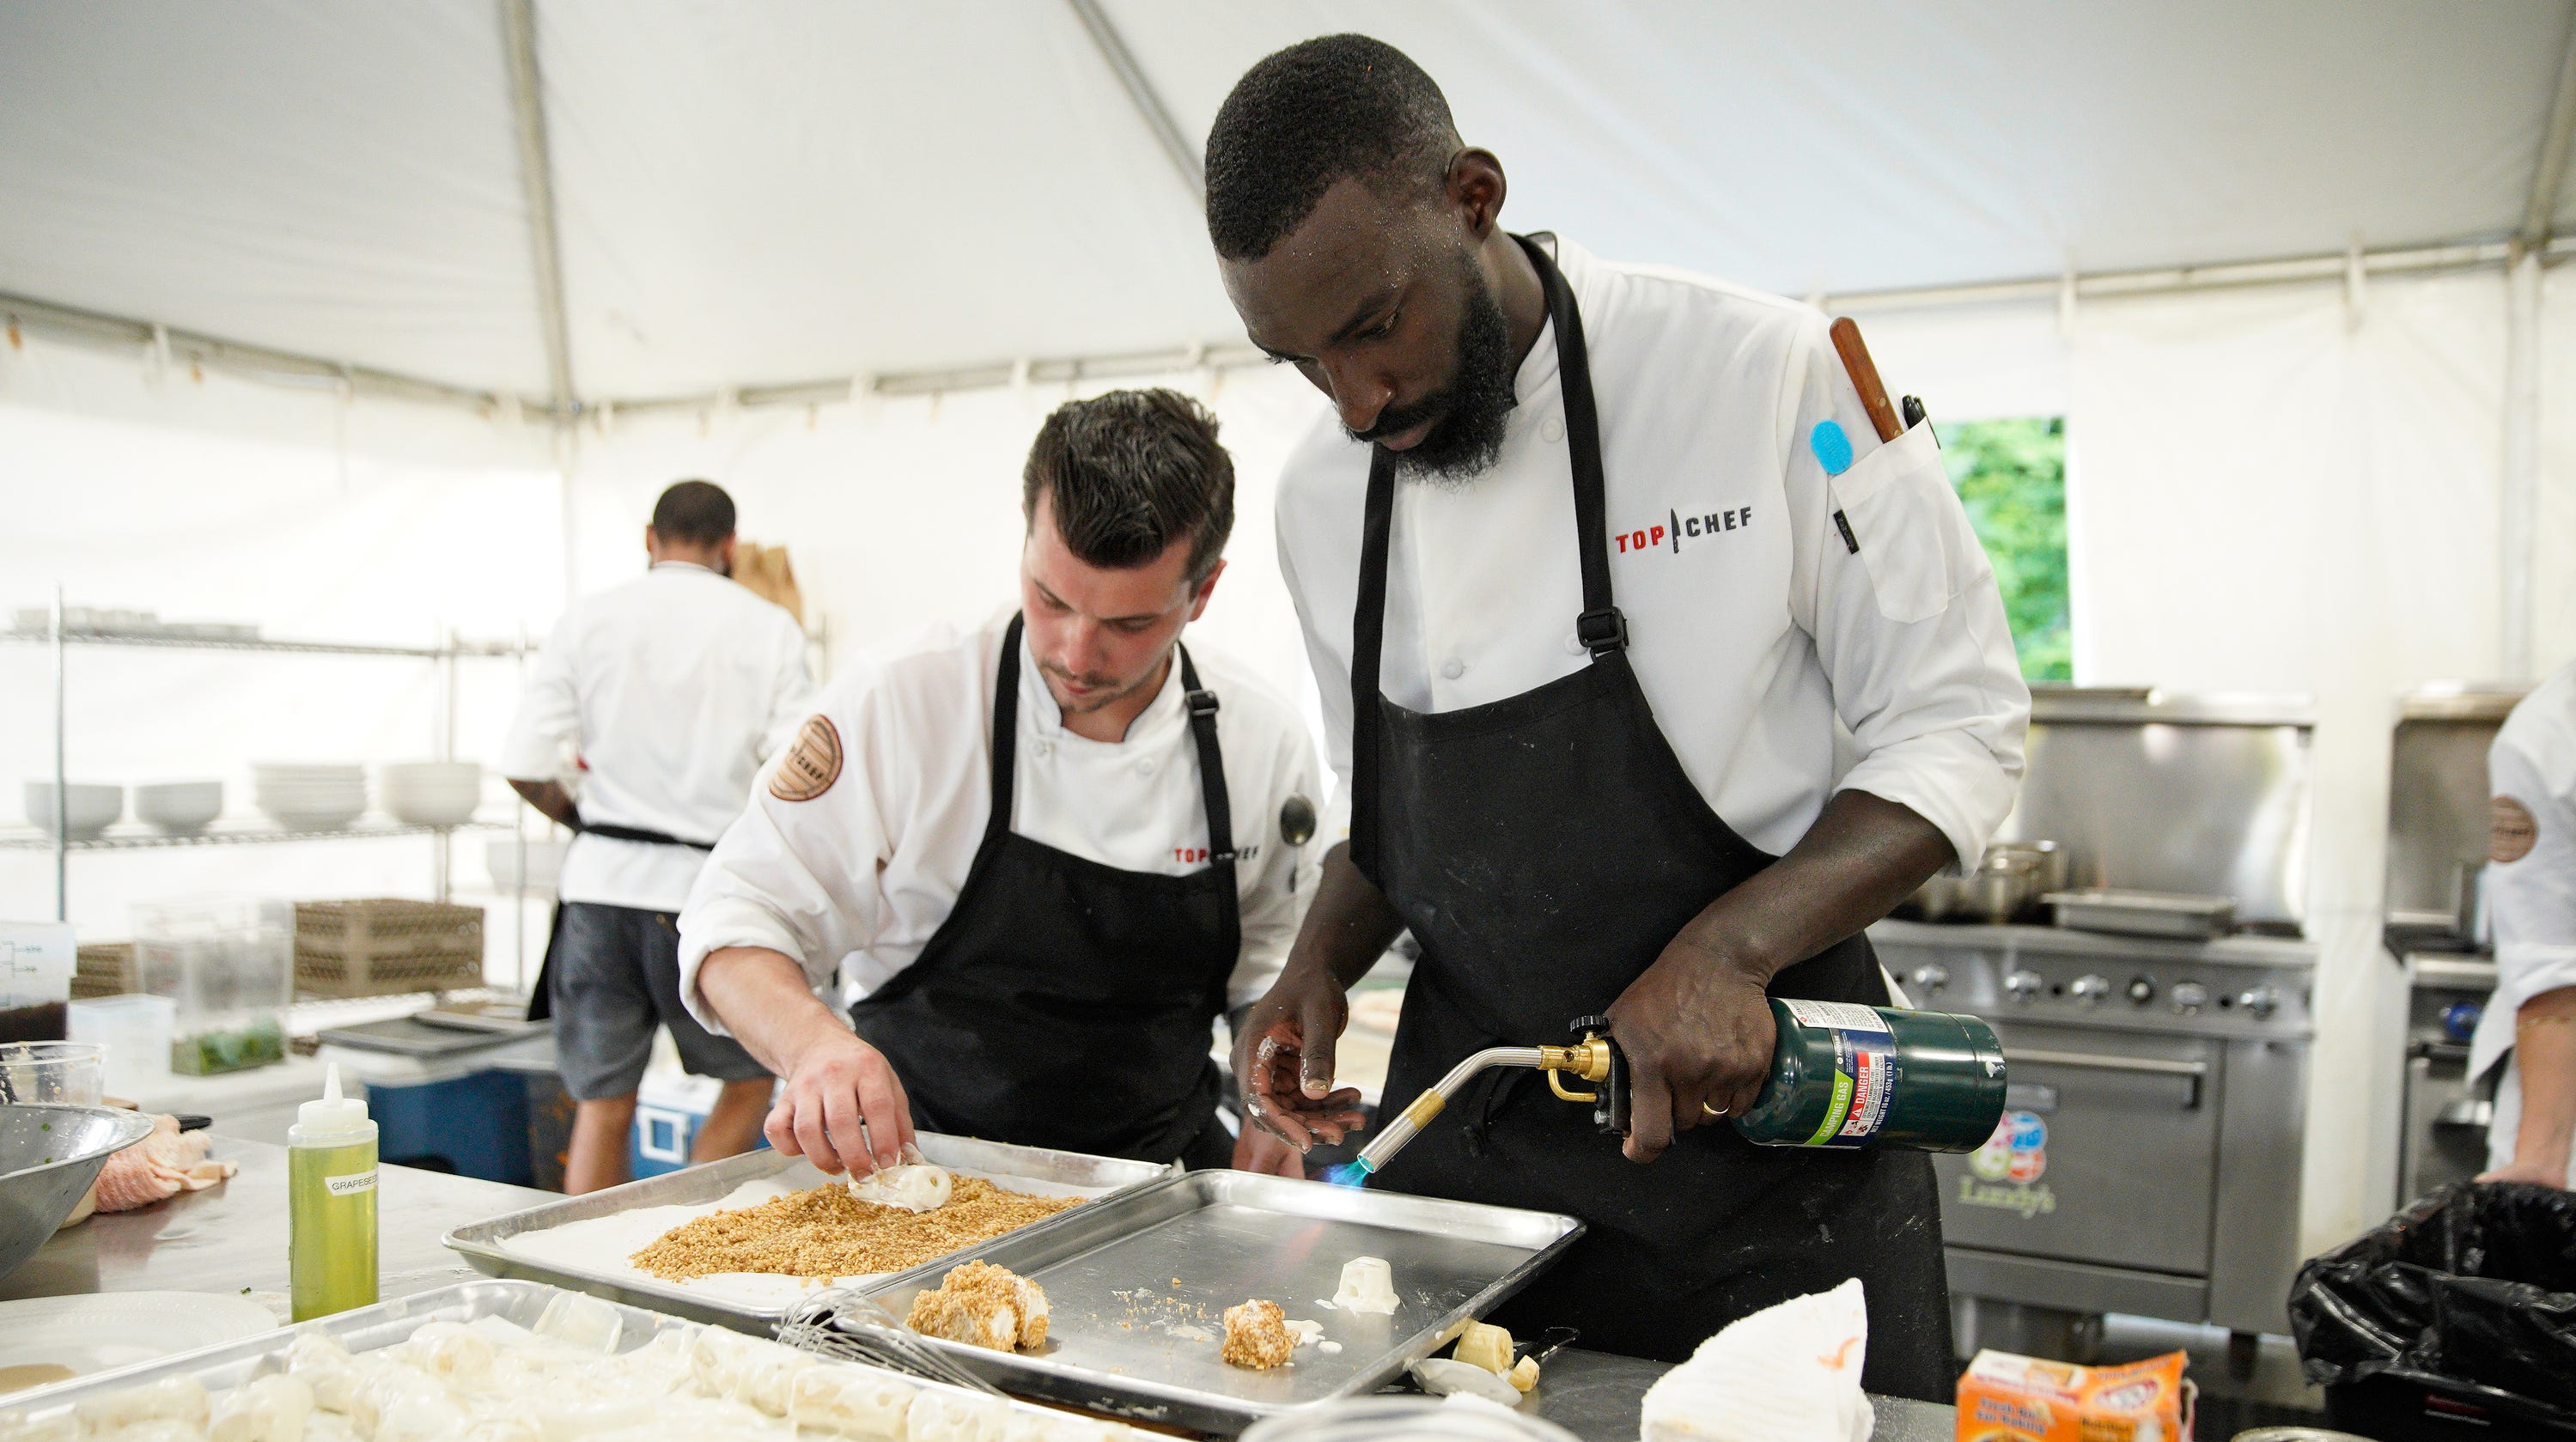 Top Chef\' season 16: Contestants tackle Kentucky cuisine